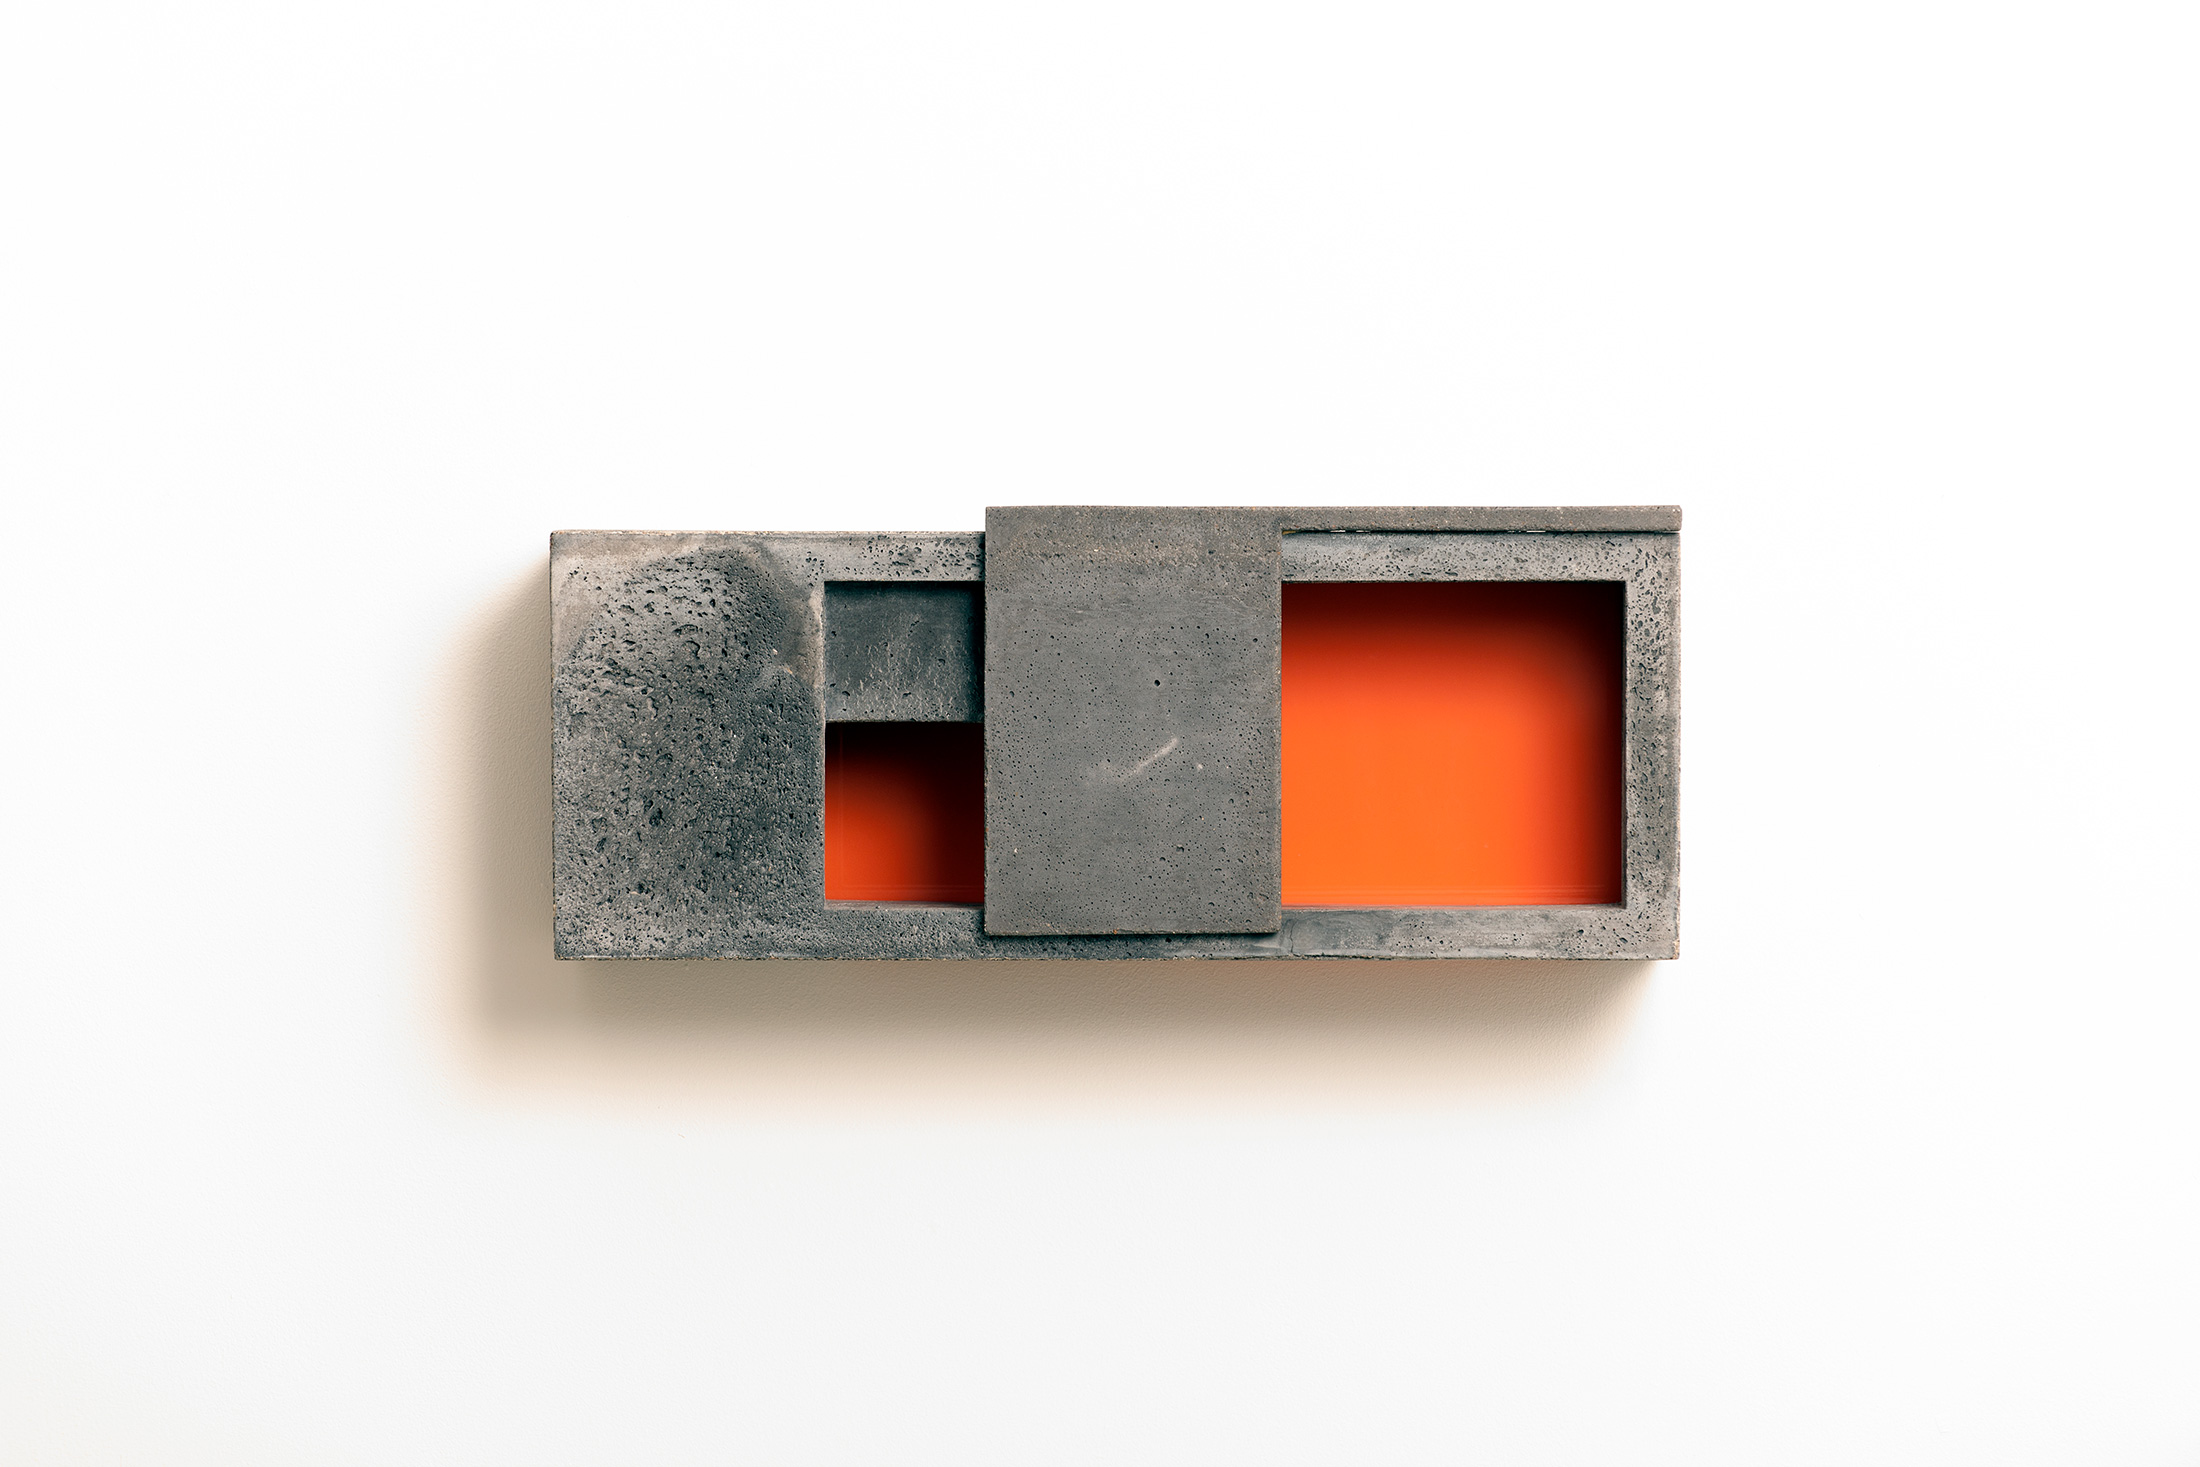 Box X/2 | 2017 | Beton,Acrylglas  | 48 x 20 x 16 cm